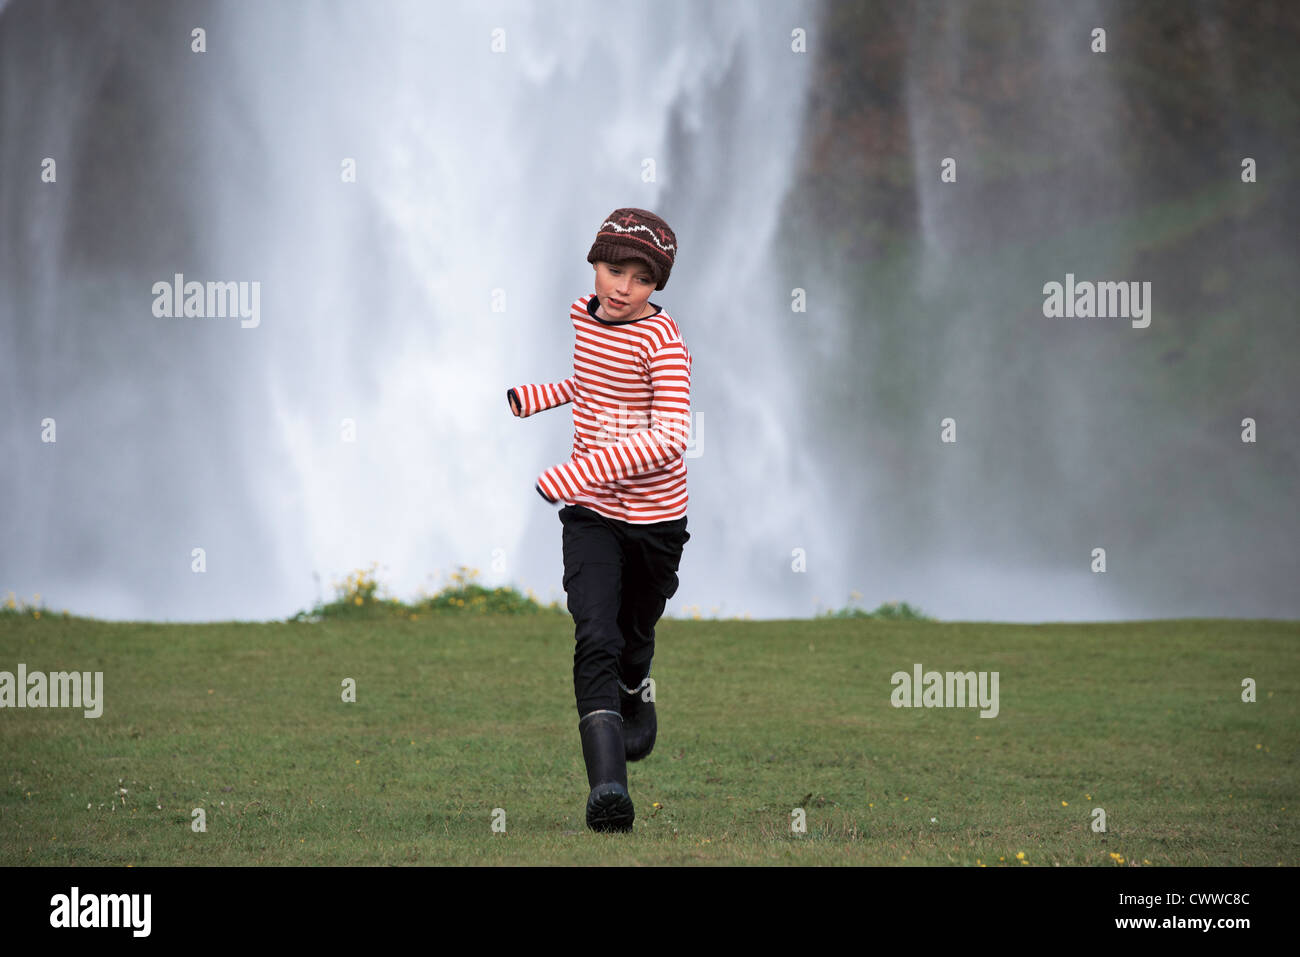 Girl running in grassy field Photo Stock